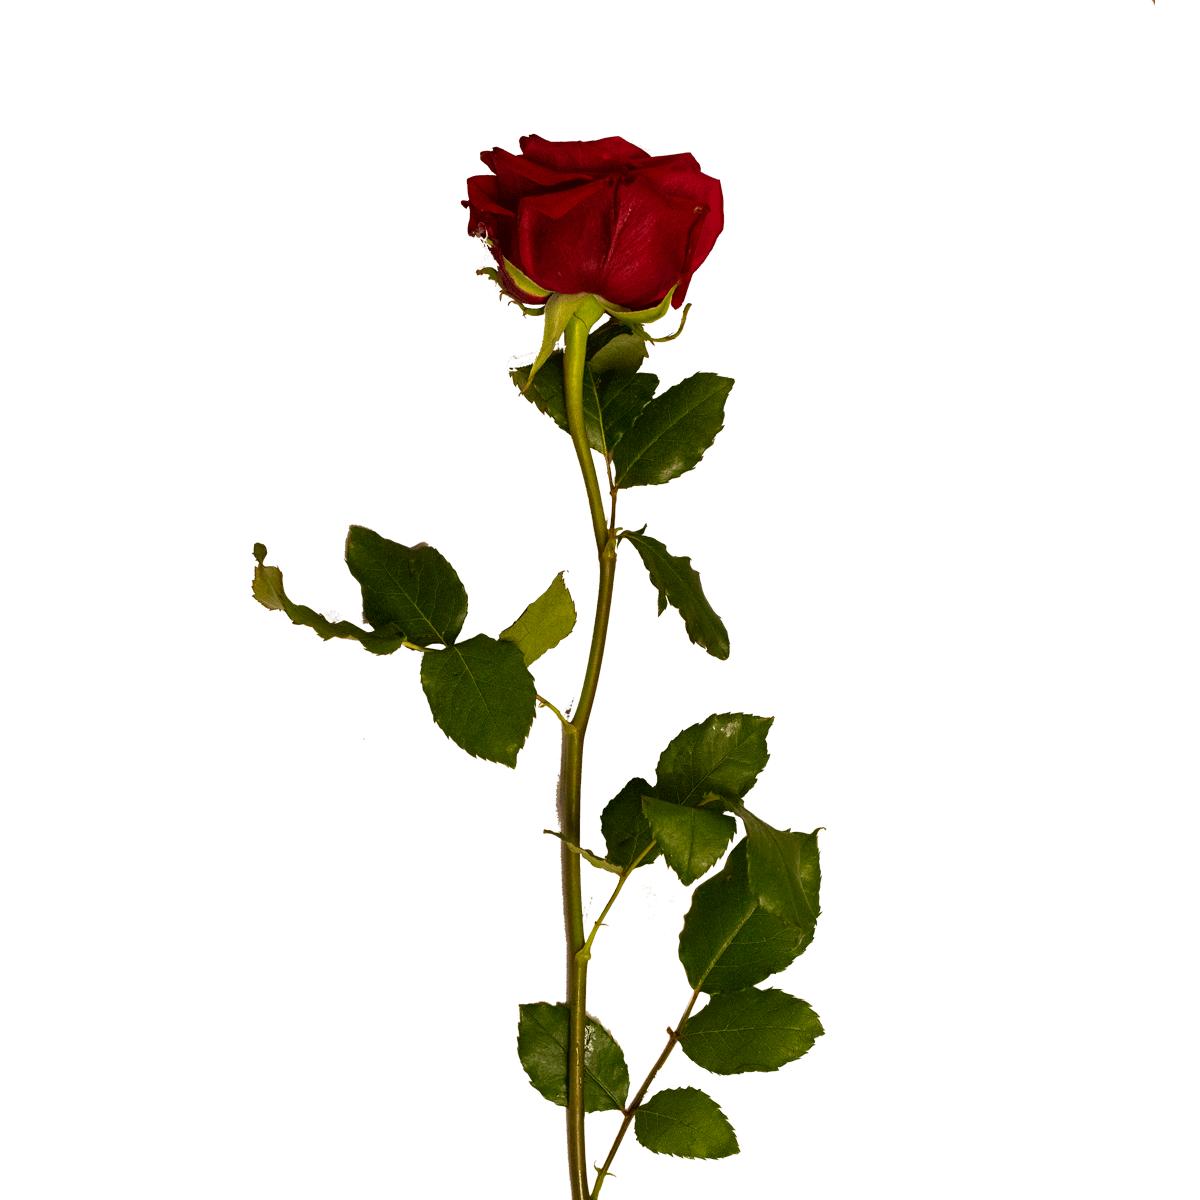 Fiori Bianchi Gambo Lungo.Rose Rosse A Gambo Lungo Fioriweb It Consegna Fiori In Italia